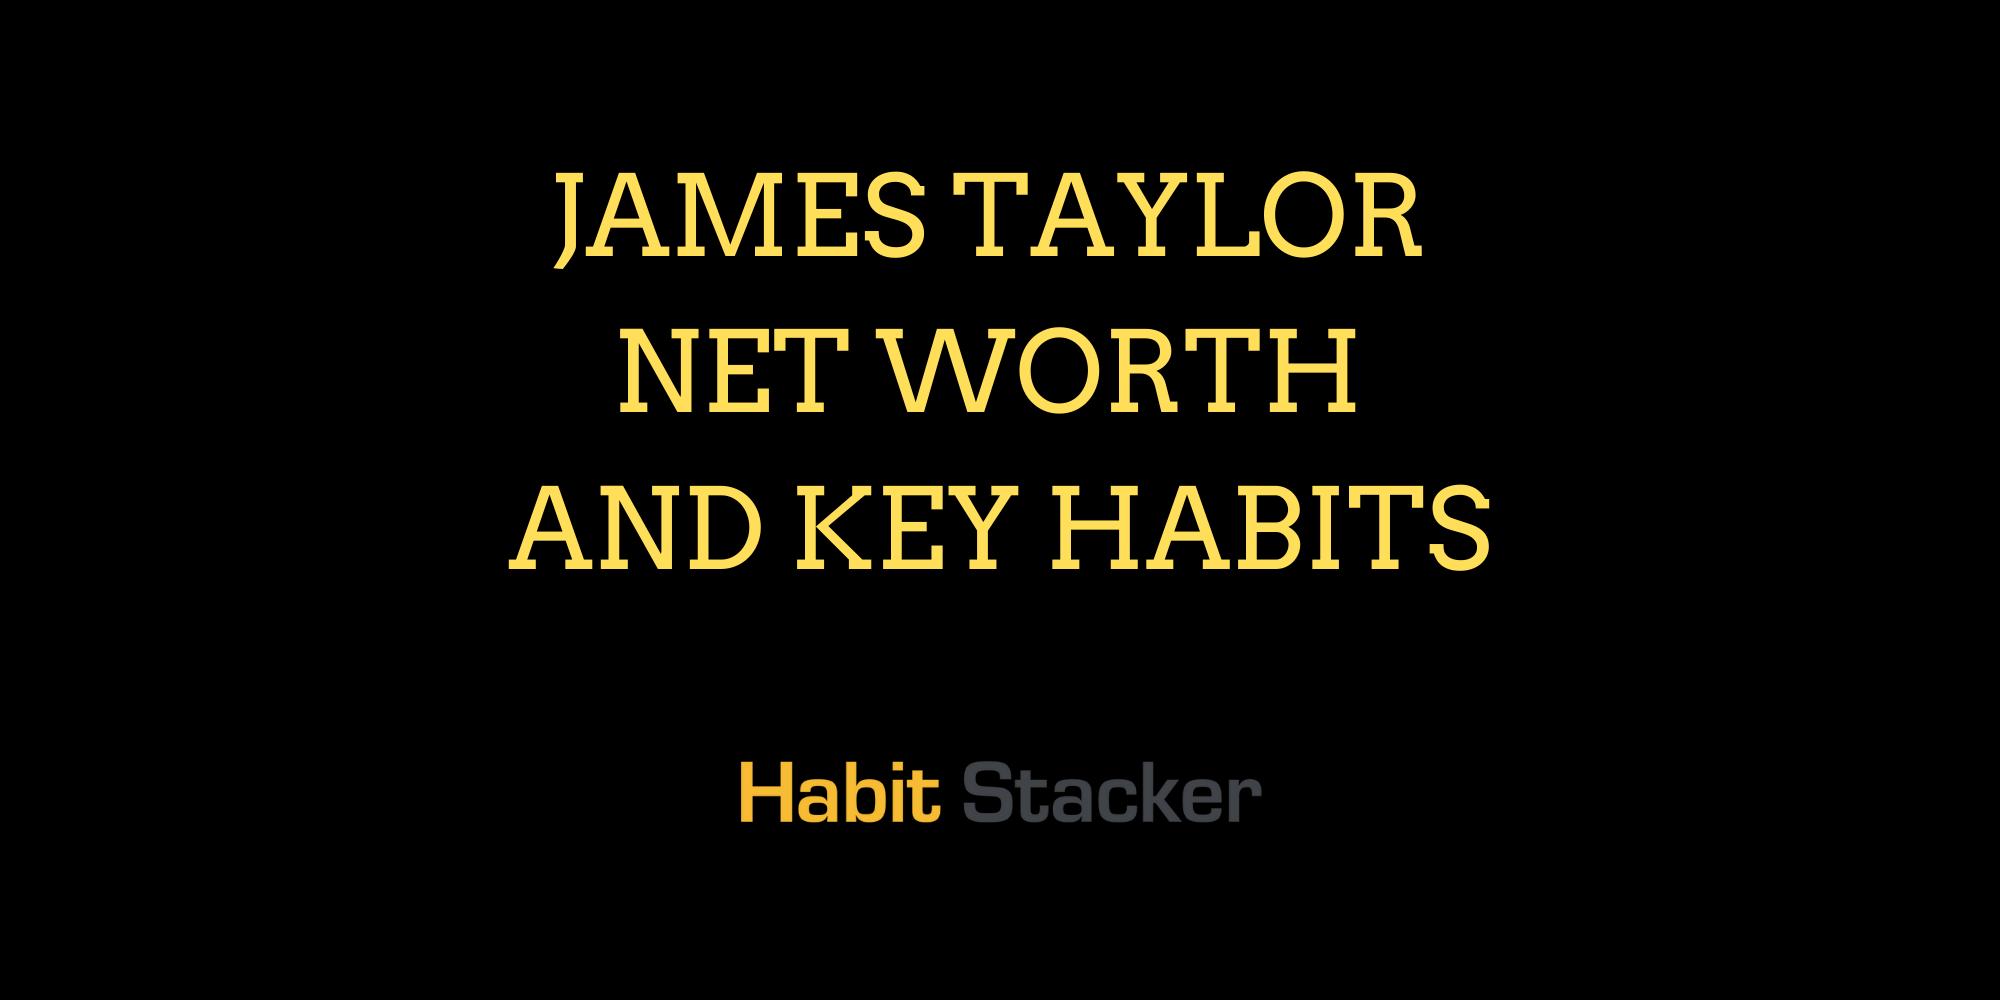 James Taylor Net Worth and Key Habits